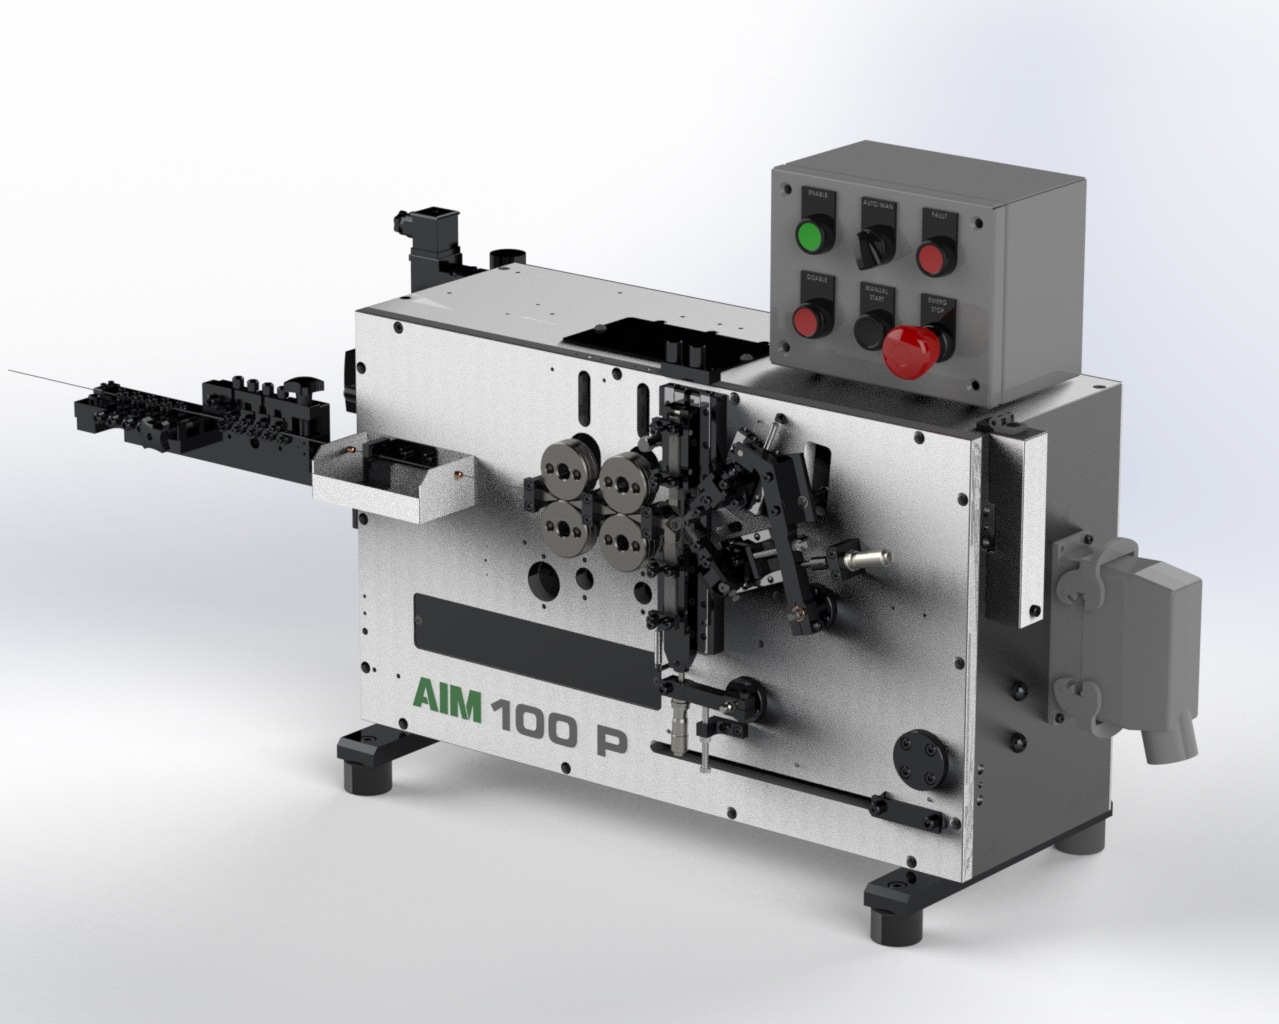 AIM 100 Pneumatic Spring Coiler - AIM 100-P